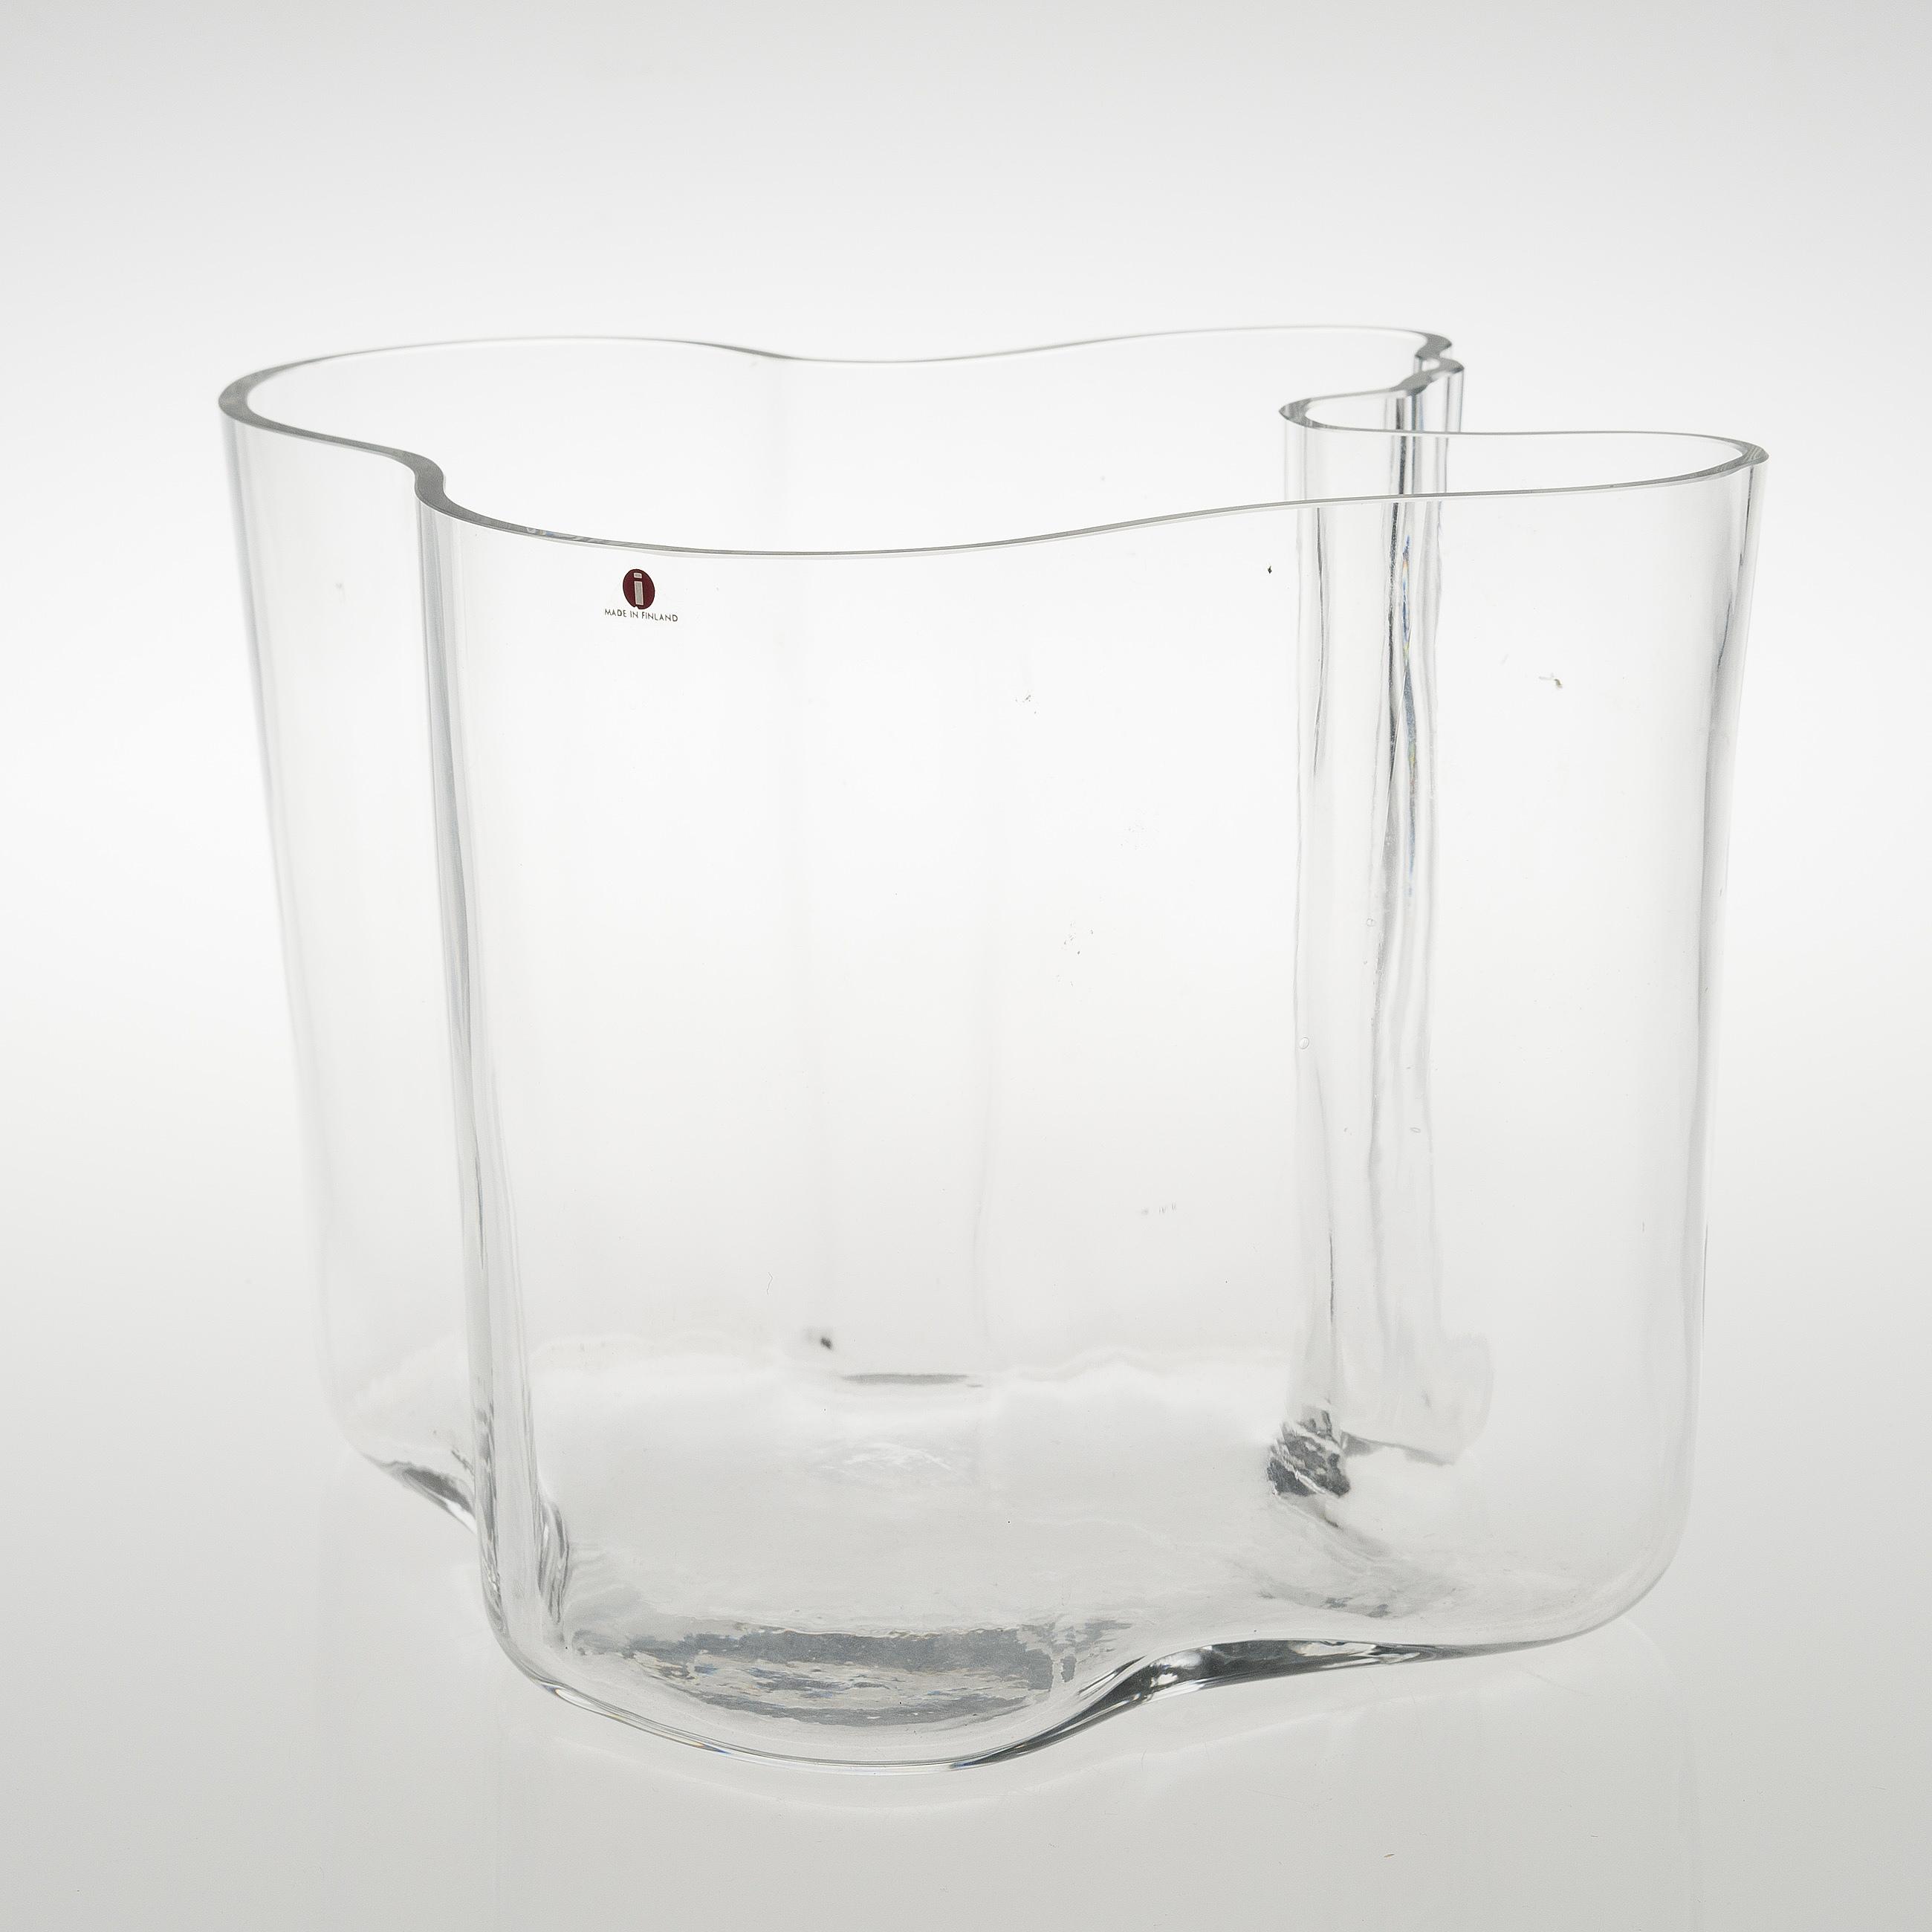 Alvar aalto an alvar aalto 1970s savoy glass vase iittala 10148894 bukobject reviewsmspy